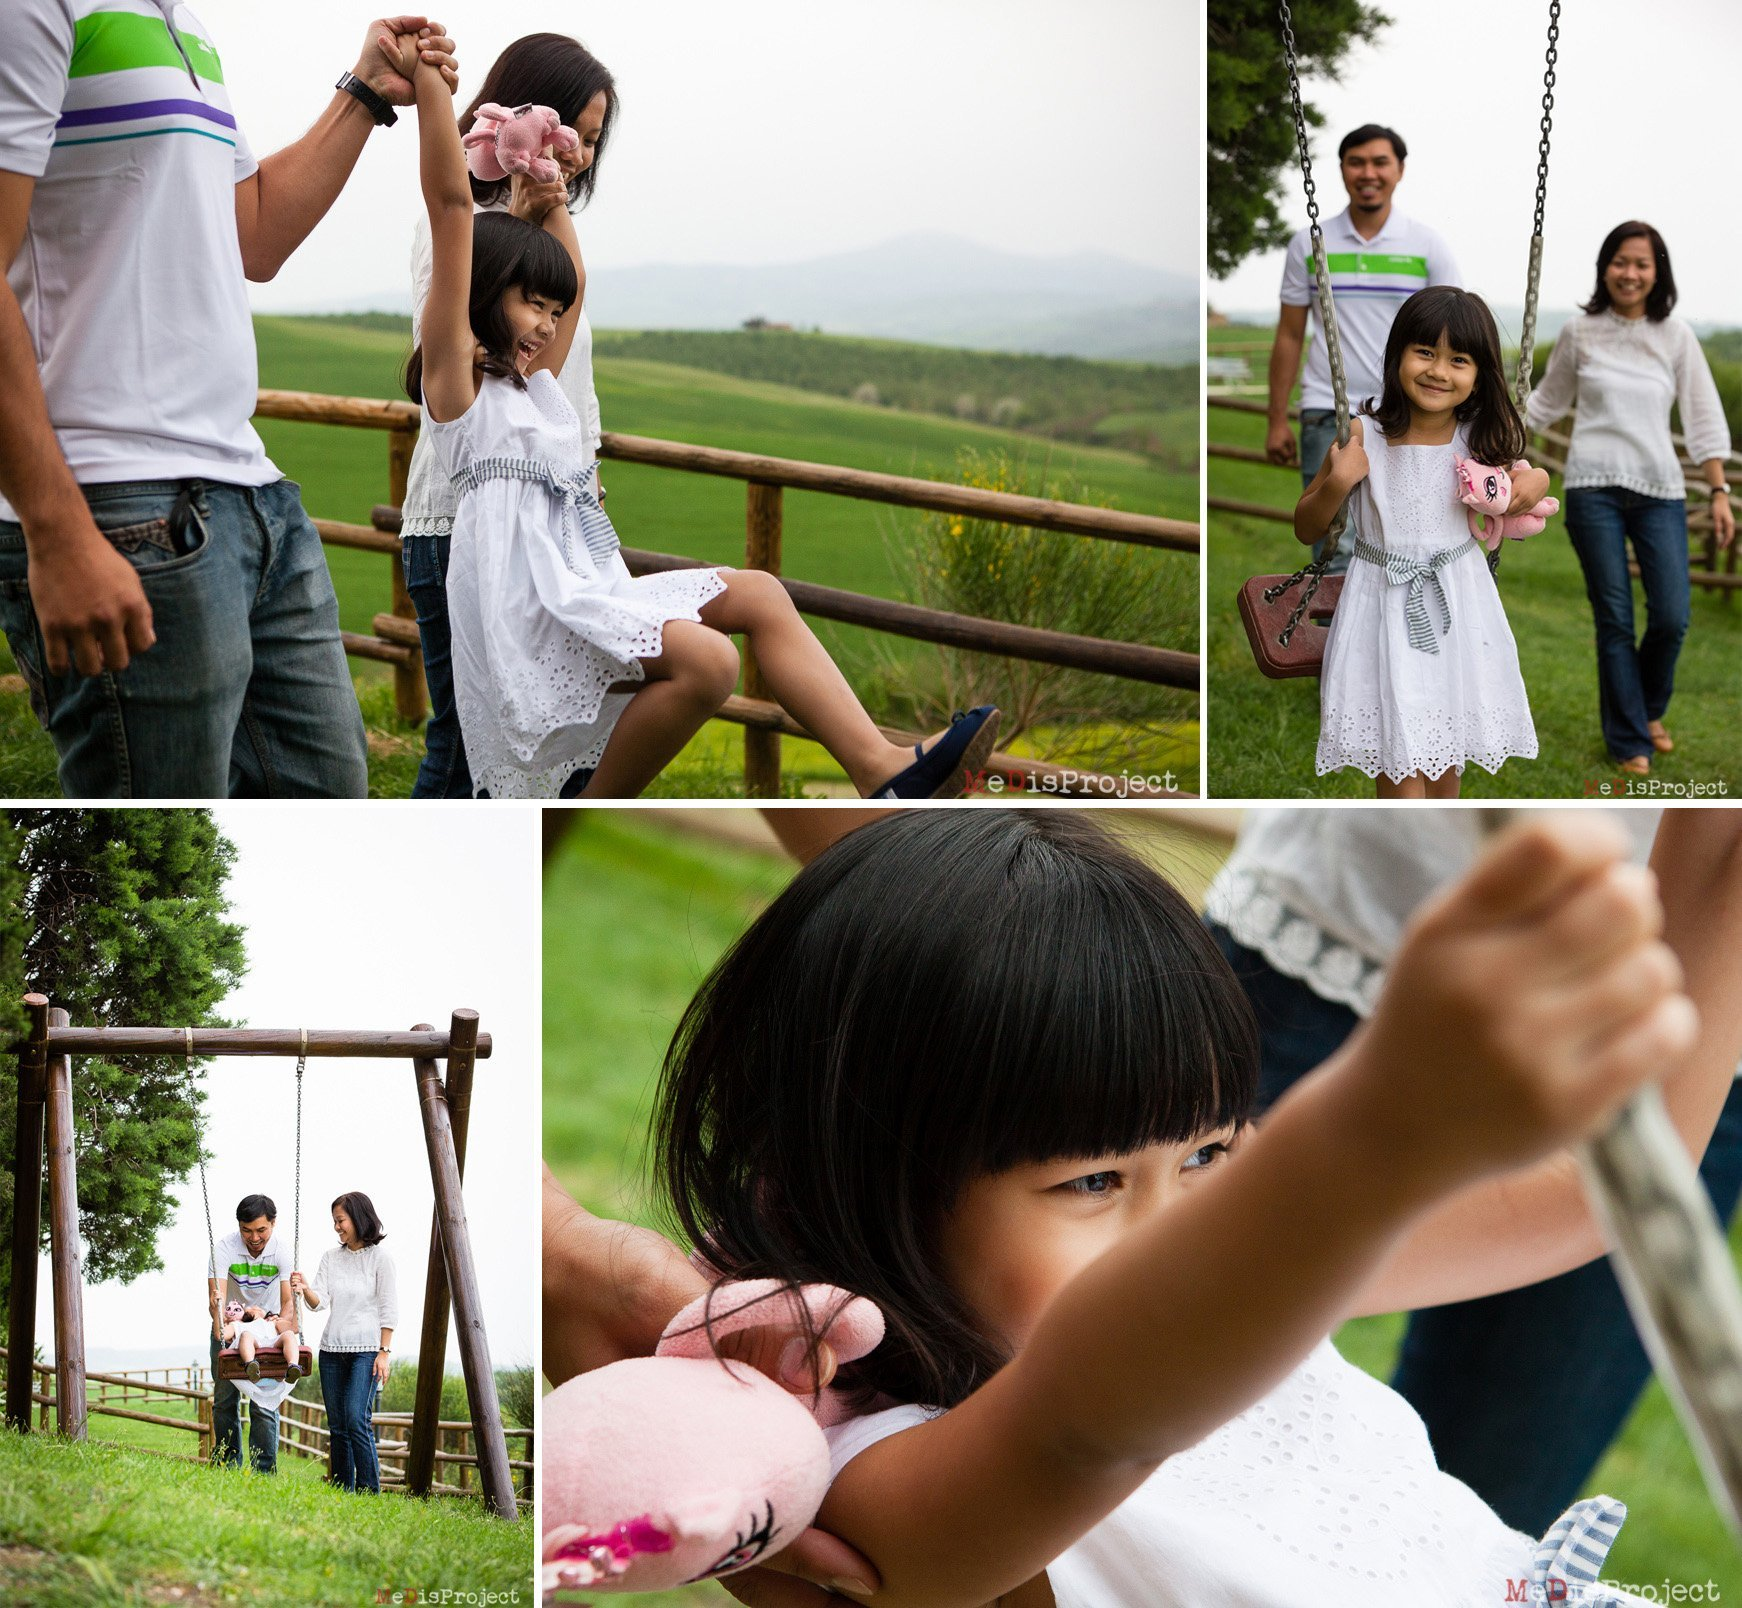 asian family portrait on a wooden swing